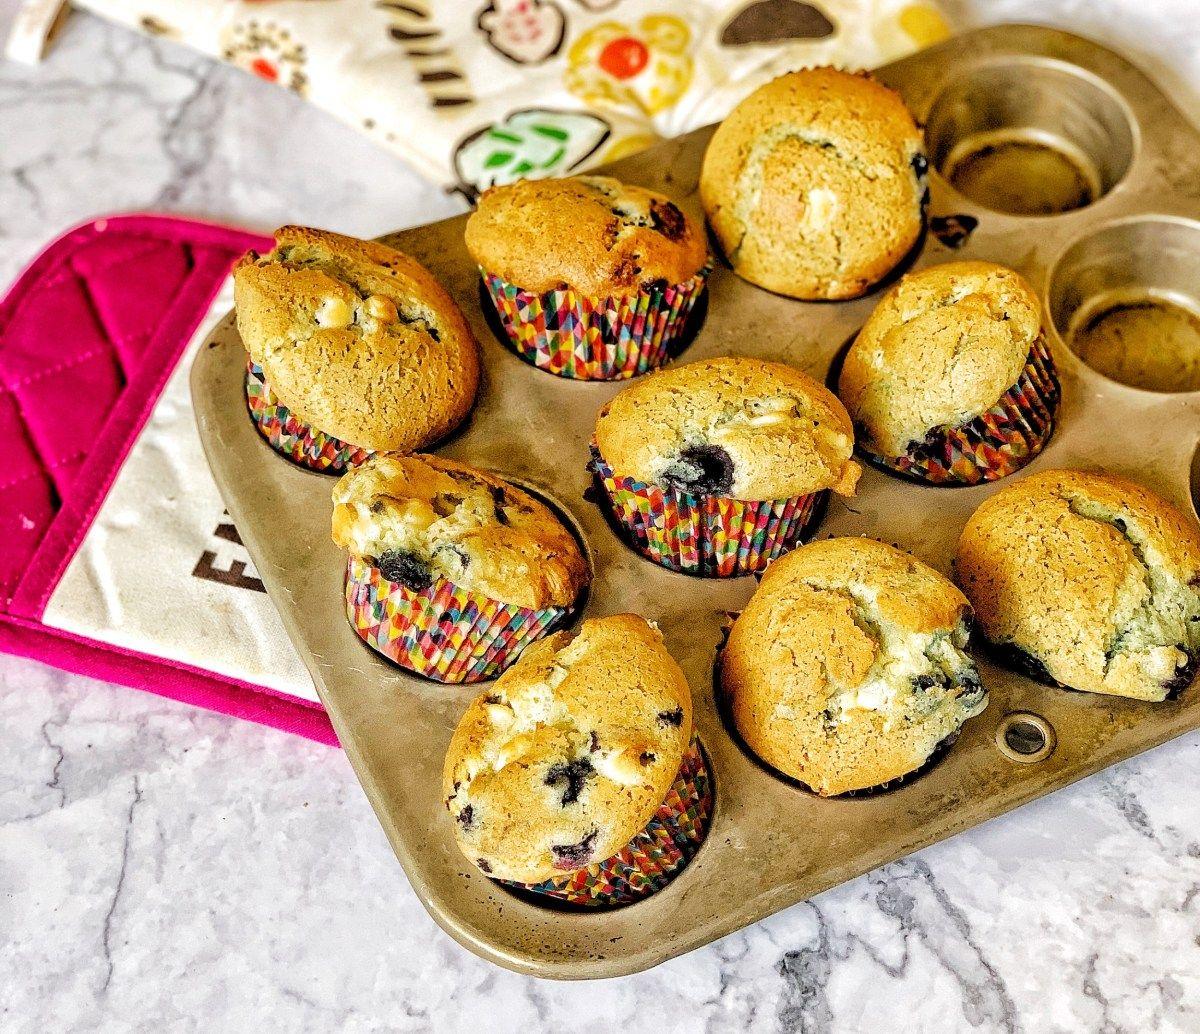 Blueberries and cream muffins from christina tosi milk